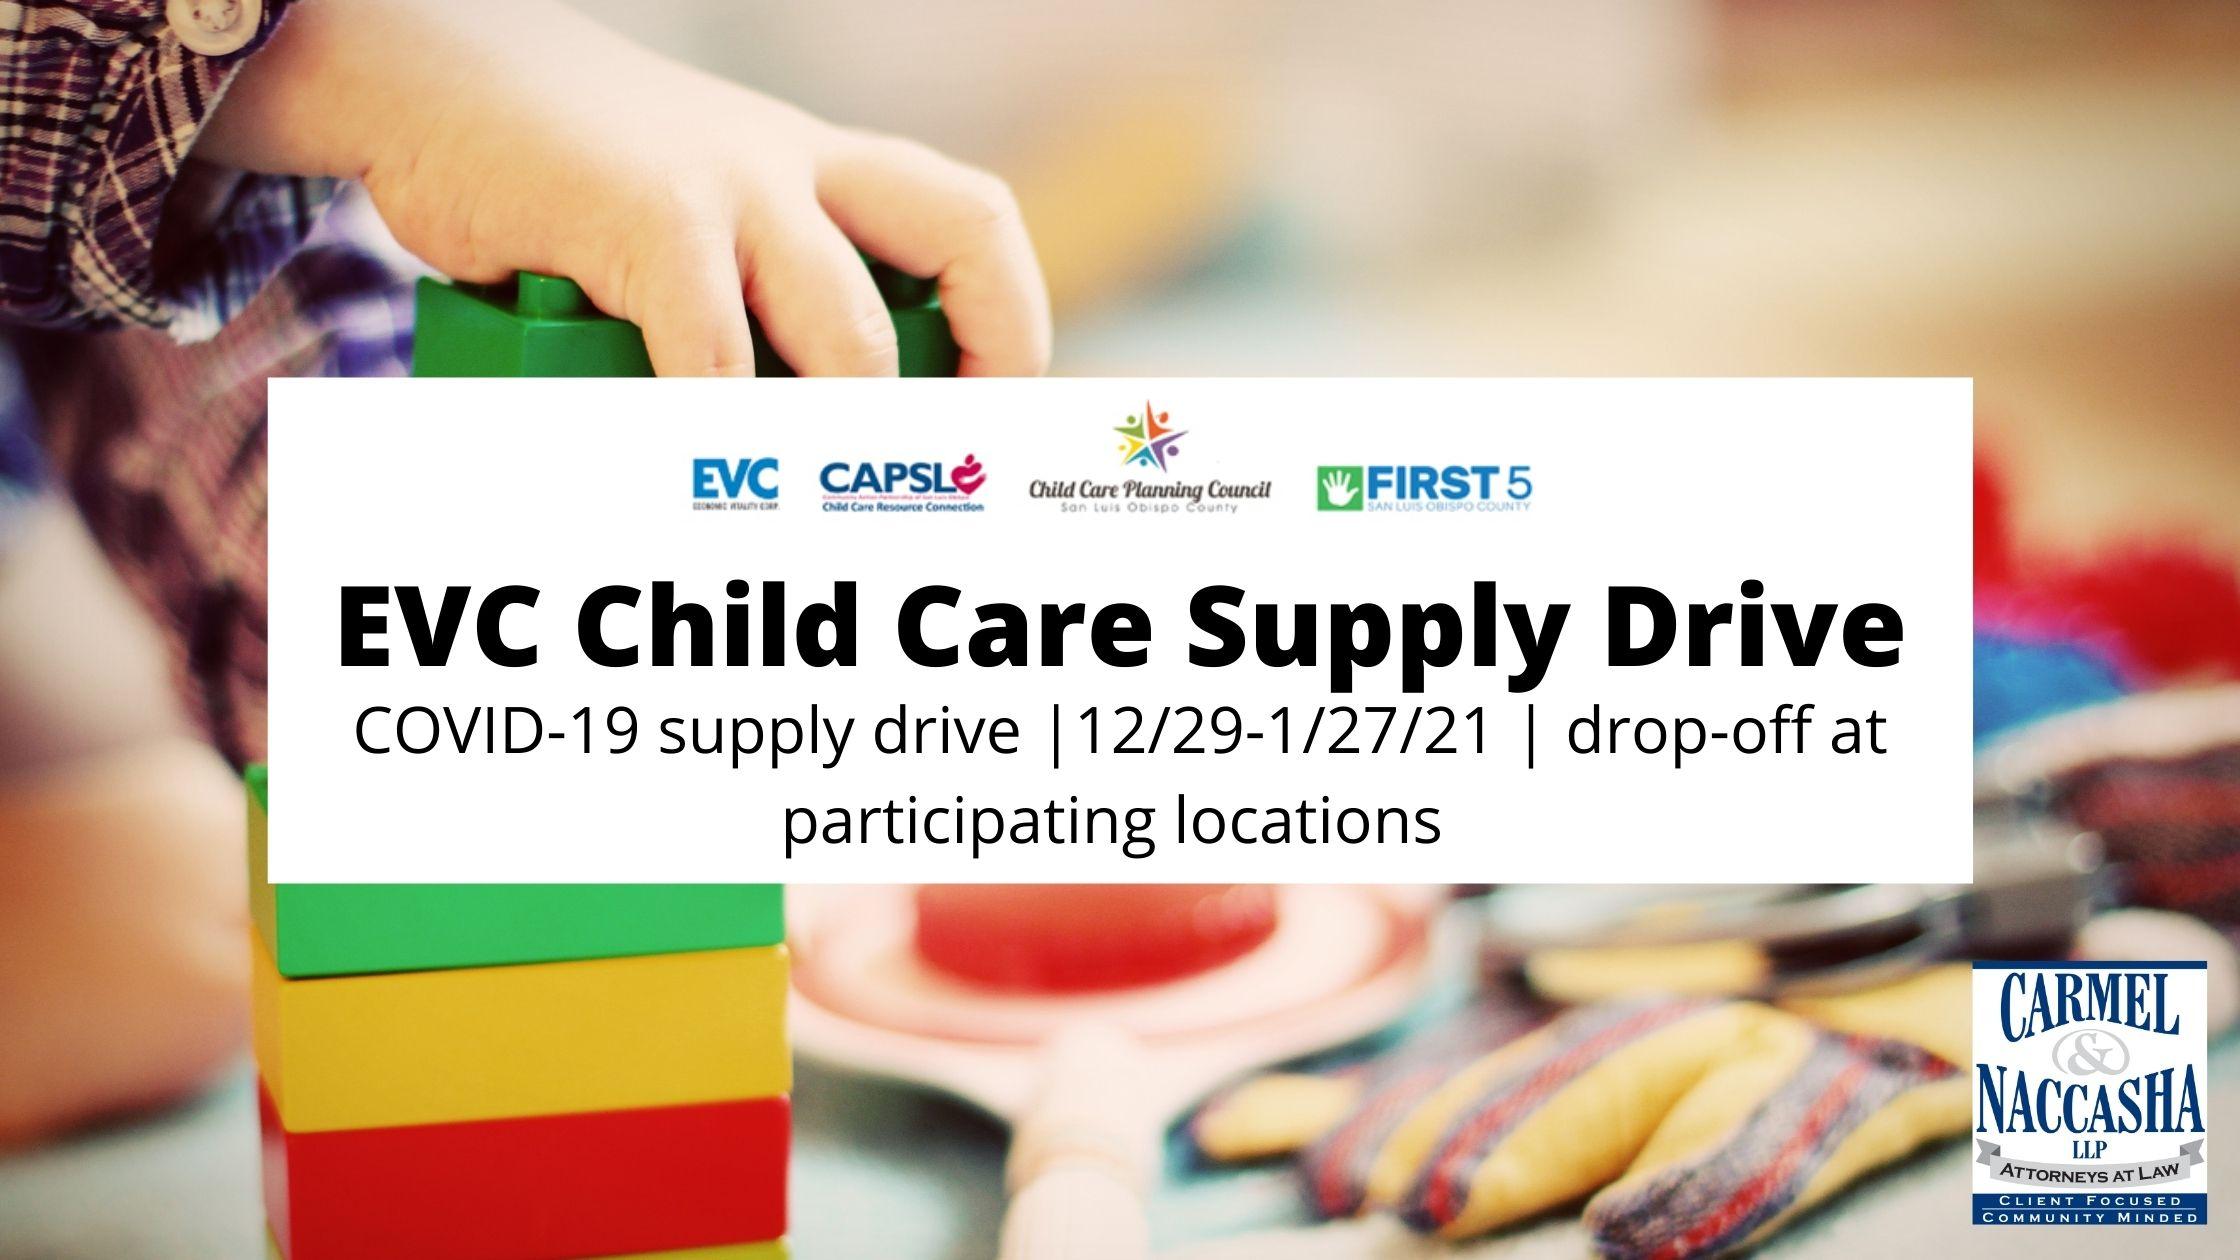 EVC Child Care Supply Drive